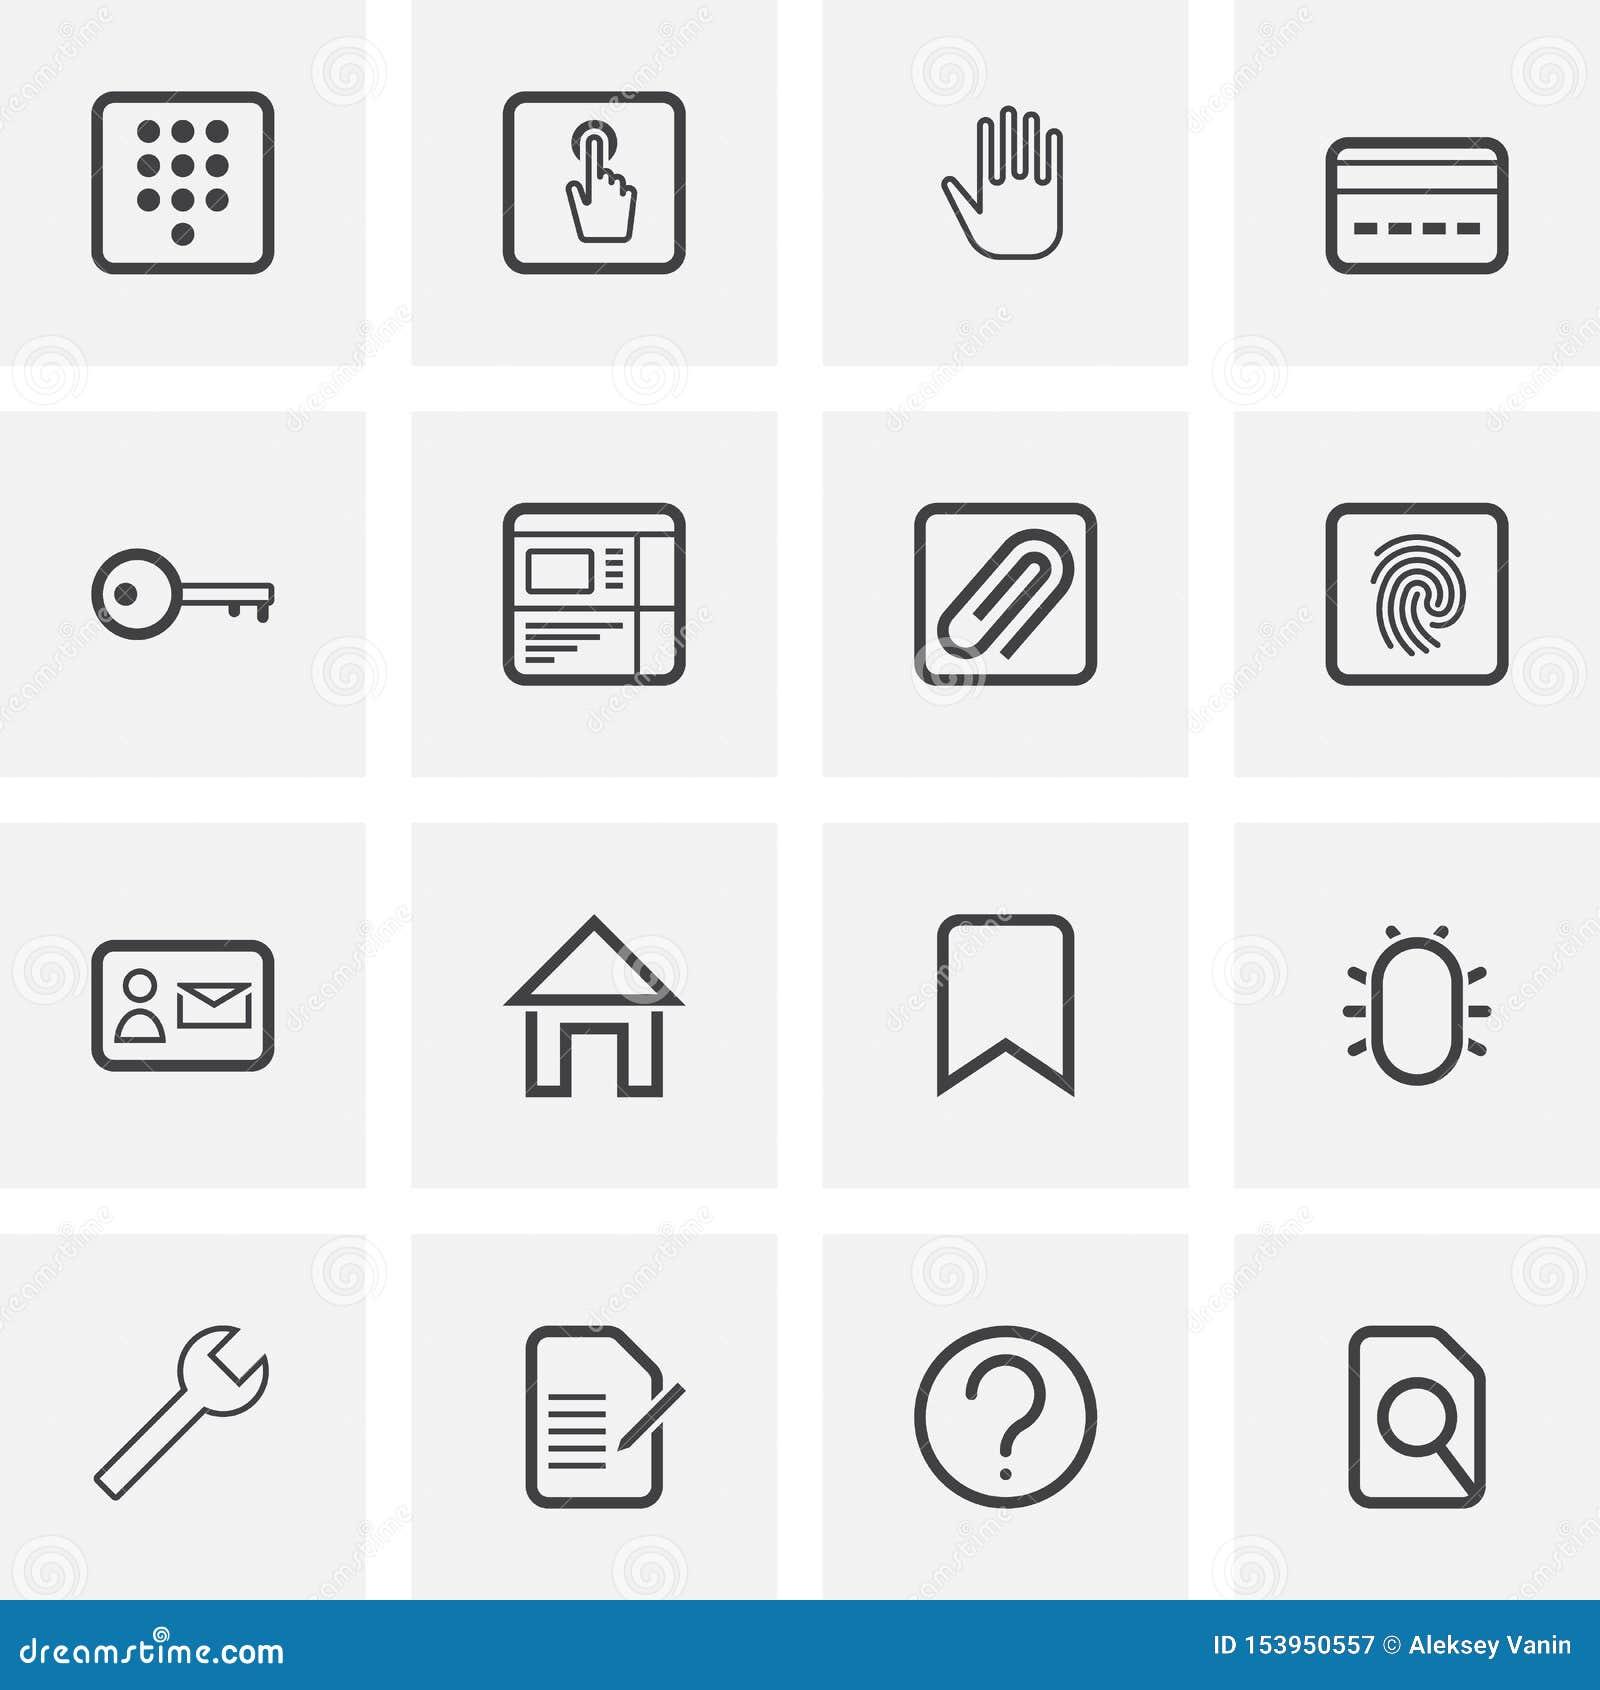 UI and UX, universal line icons set